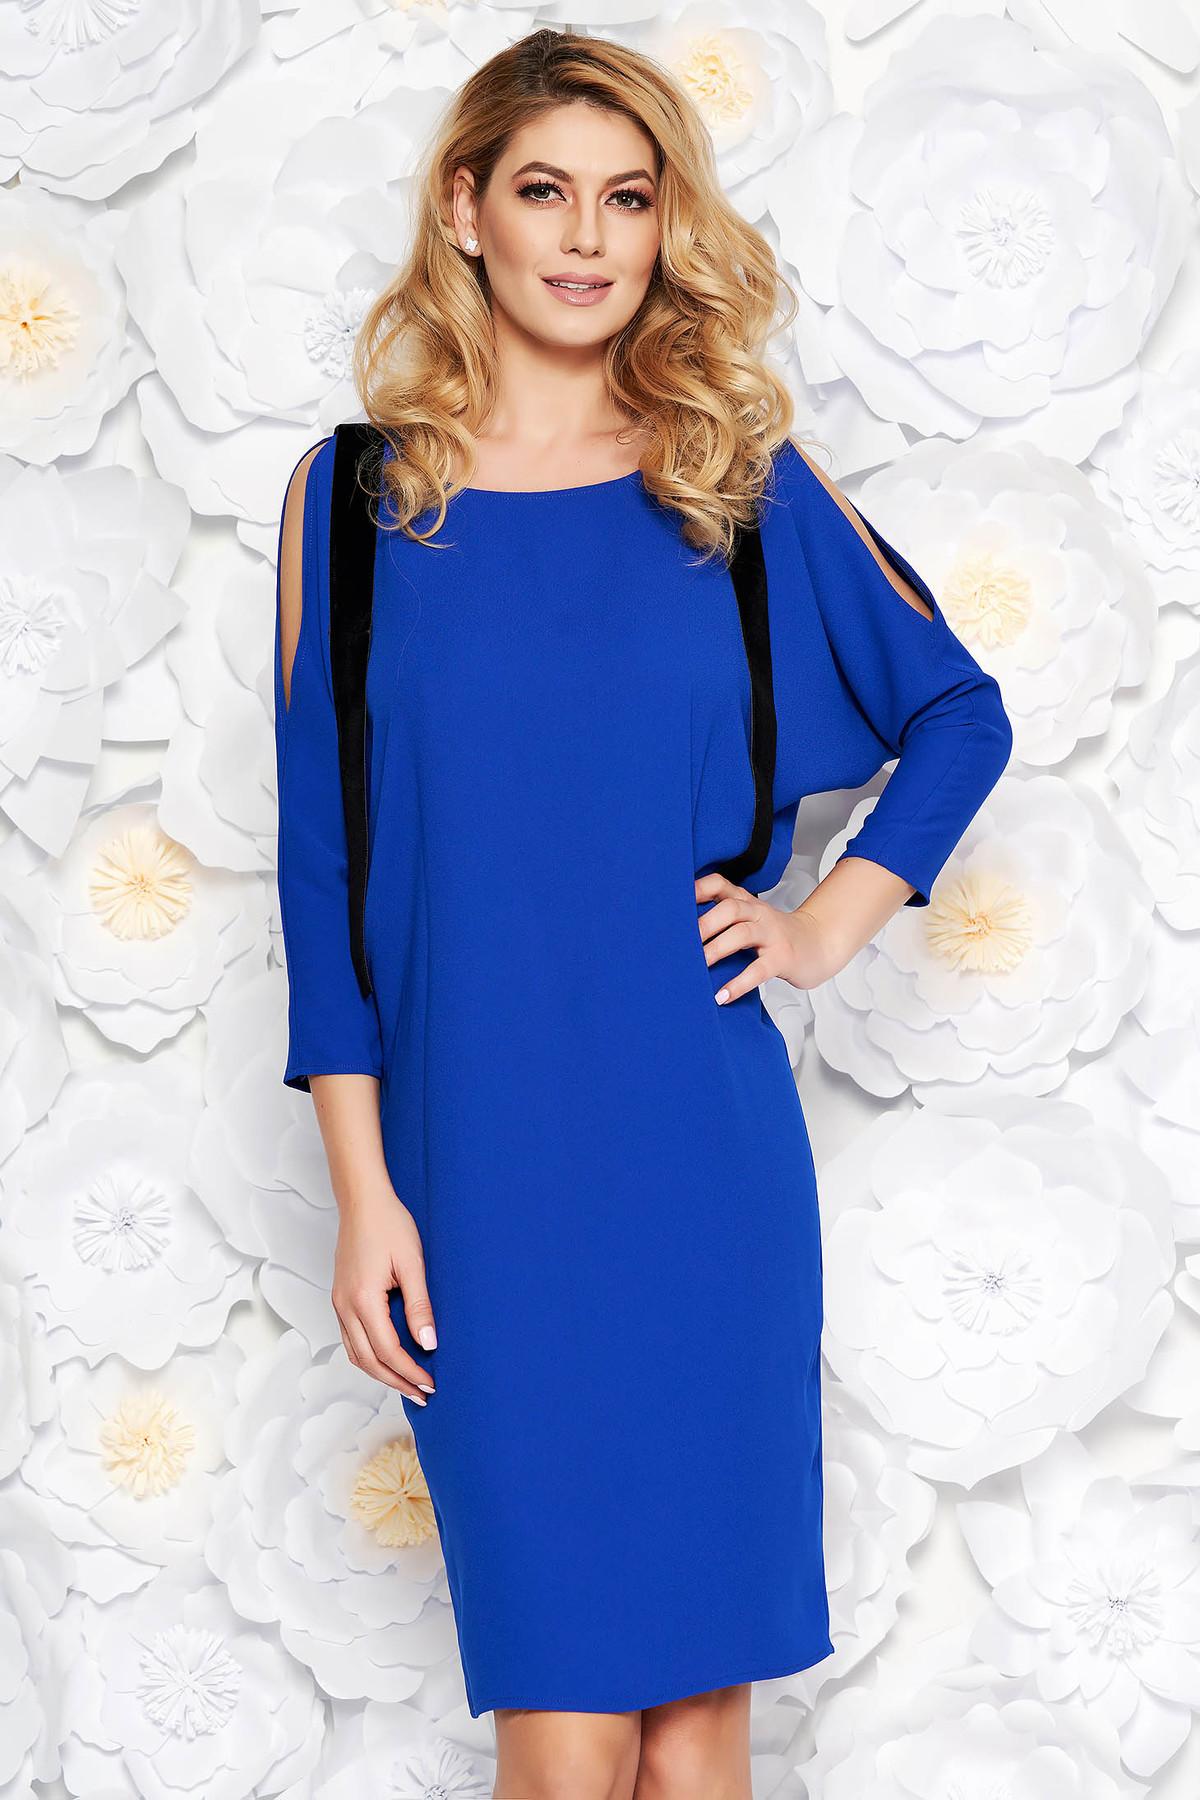 Rochie albastra eleganta cu un croi drept din material subtire cu umeri decupati